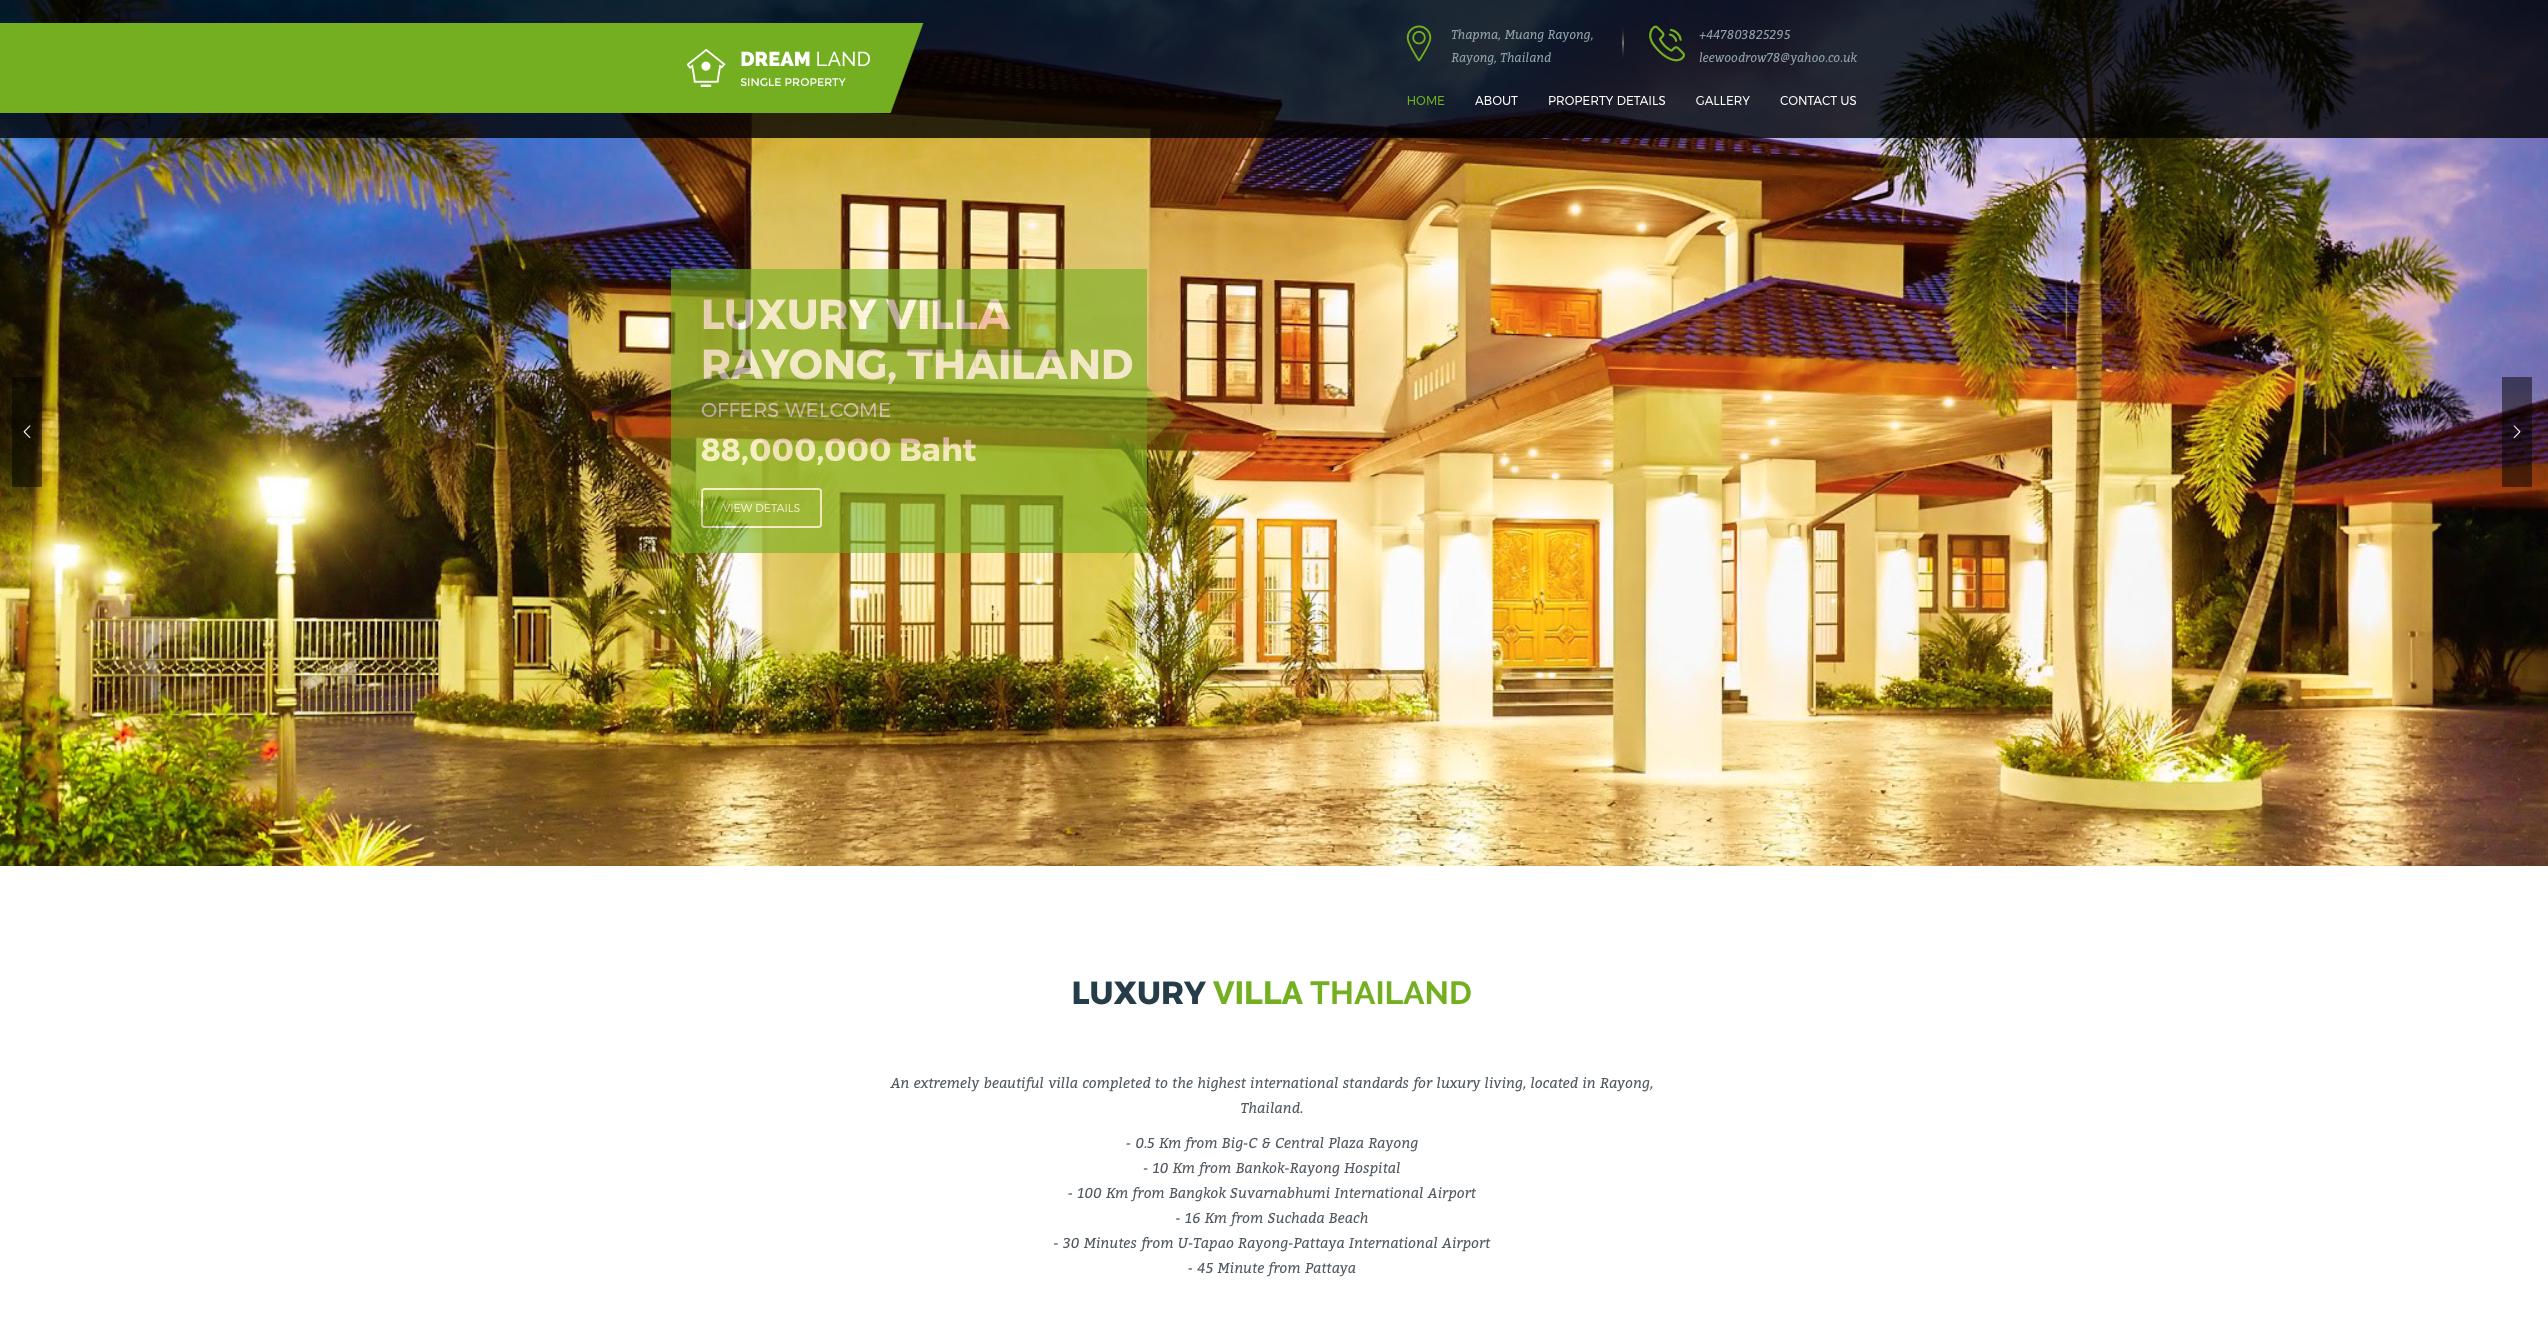 Luxury Villa Thailand